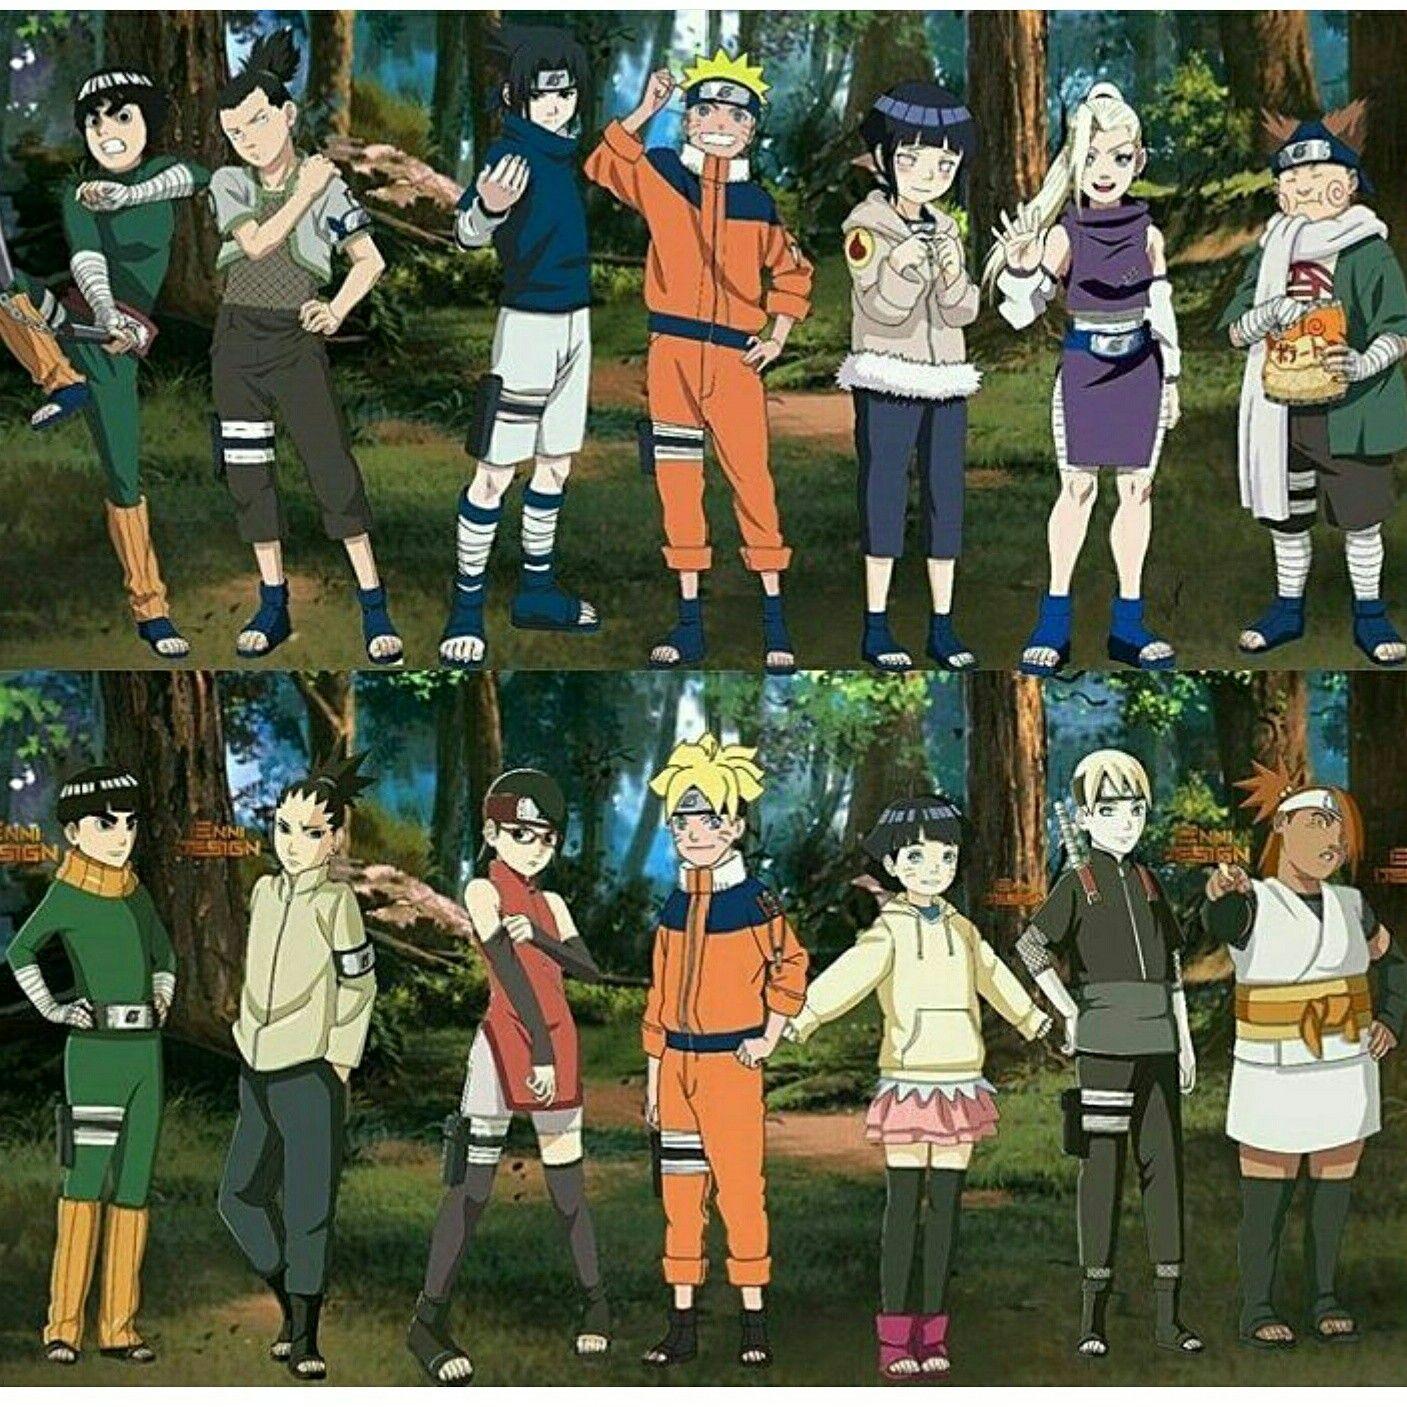 боруто все персонажи с фото и именами данном разделе